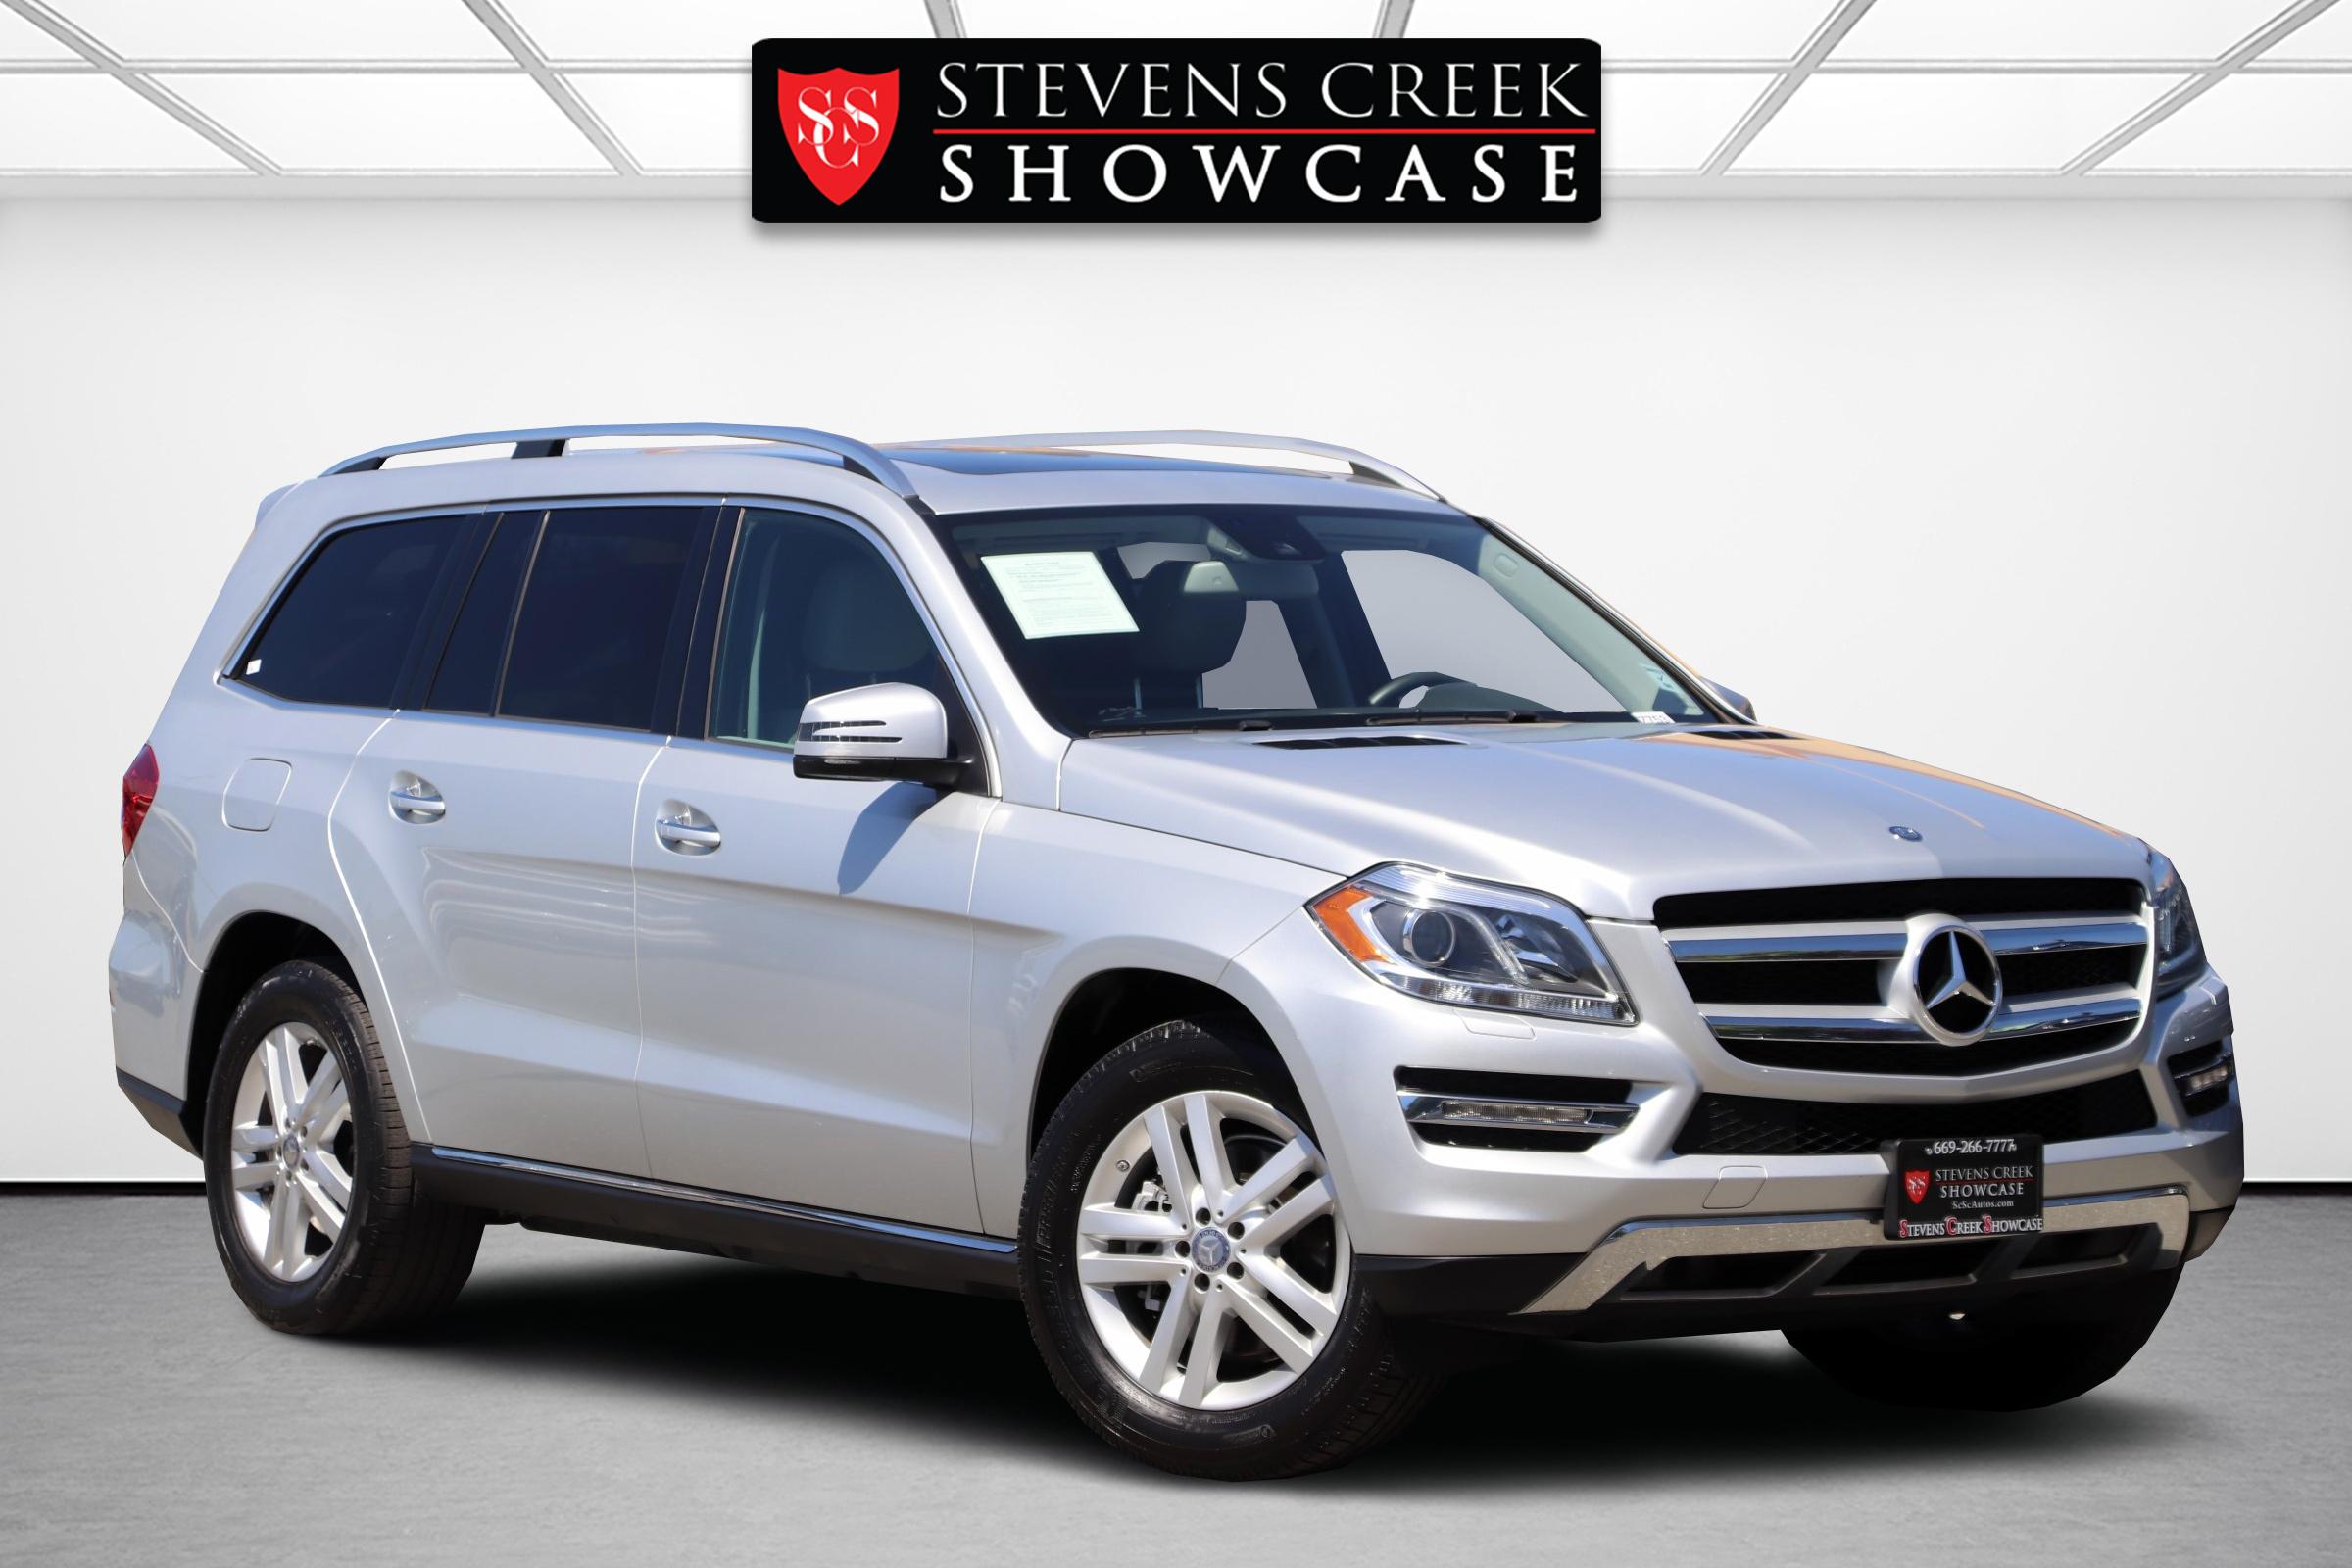 Mercedes Stevens Creek >> 2016 Mercedes Benz Gl 450 Suv Stevens Creek Showcase